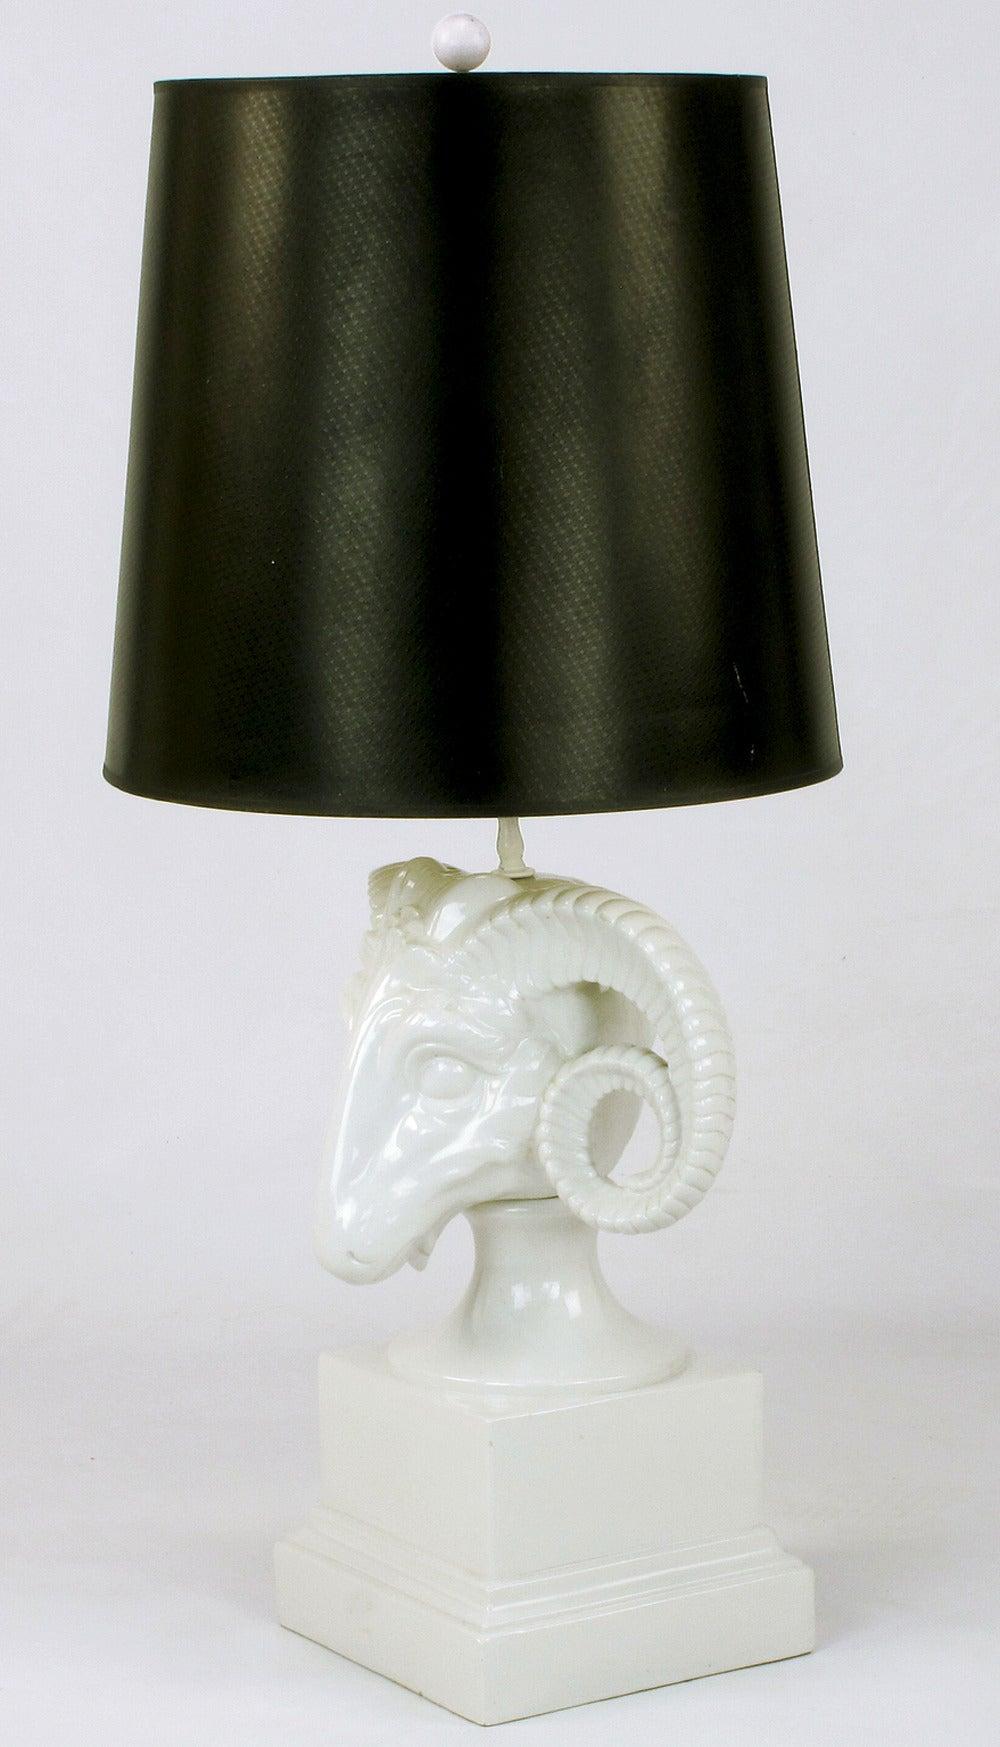 chapman white ceramic ram 39 s head table lamp at 1stdibs. Black Bedroom Furniture Sets. Home Design Ideas